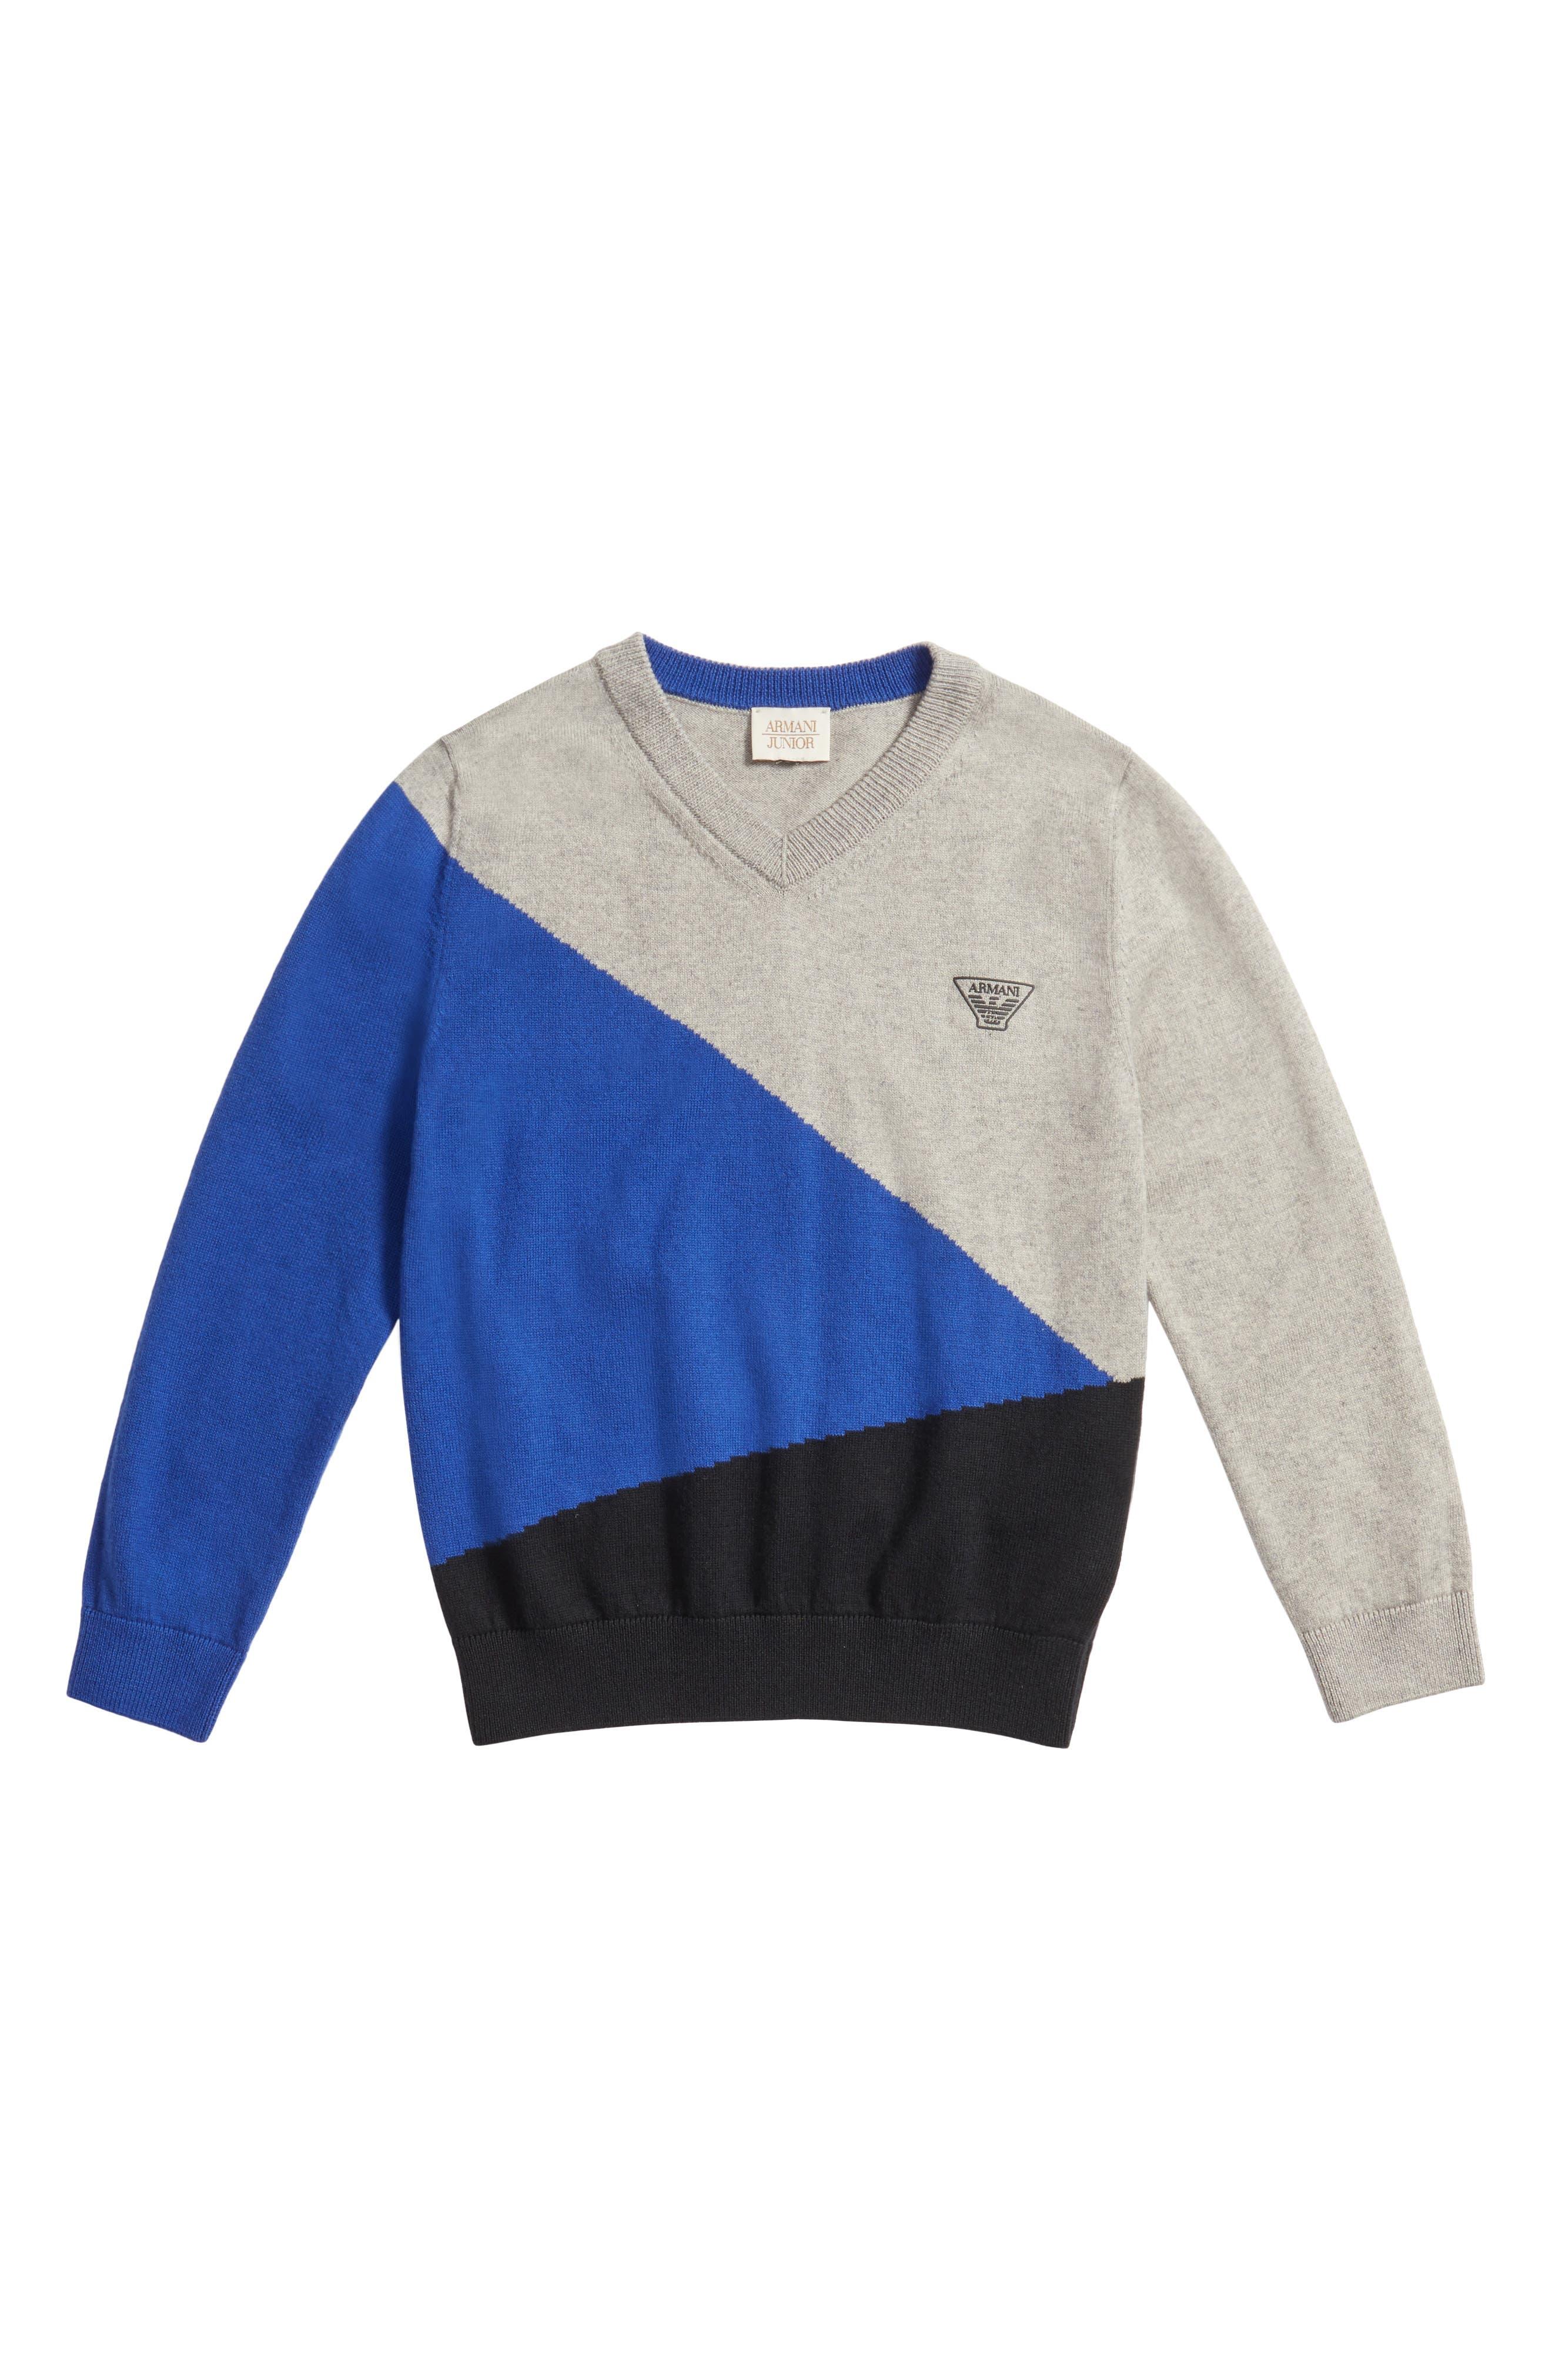 Colorblock Sweater,                             Main thumbnail 1, color,                             482